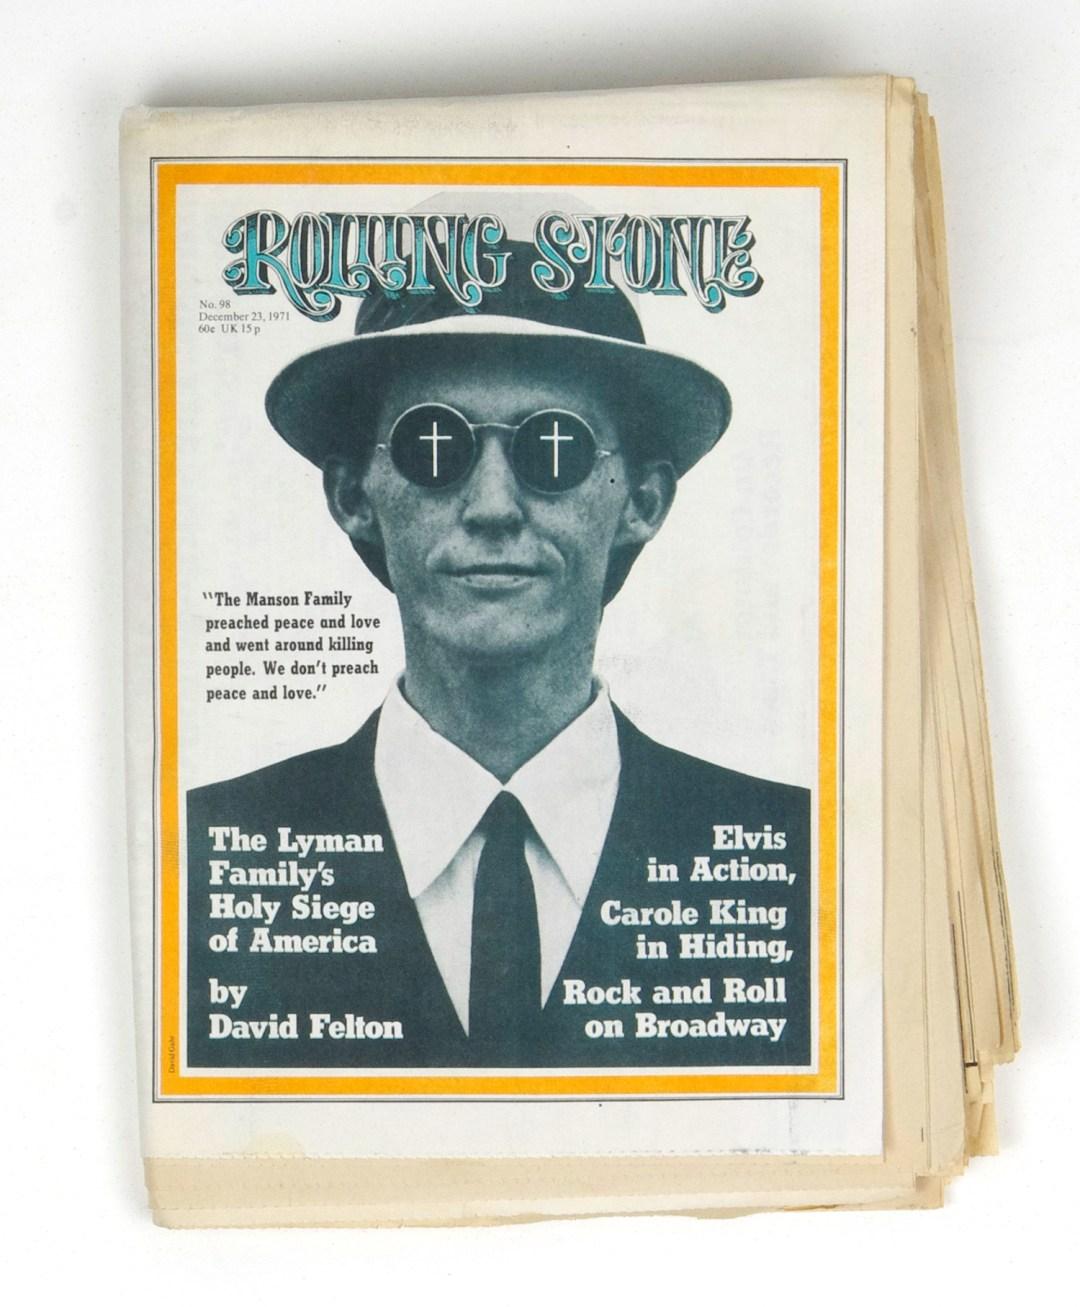 Rolling Stone Magazine 1971 Dec 23 No. 98 Mel Lyman